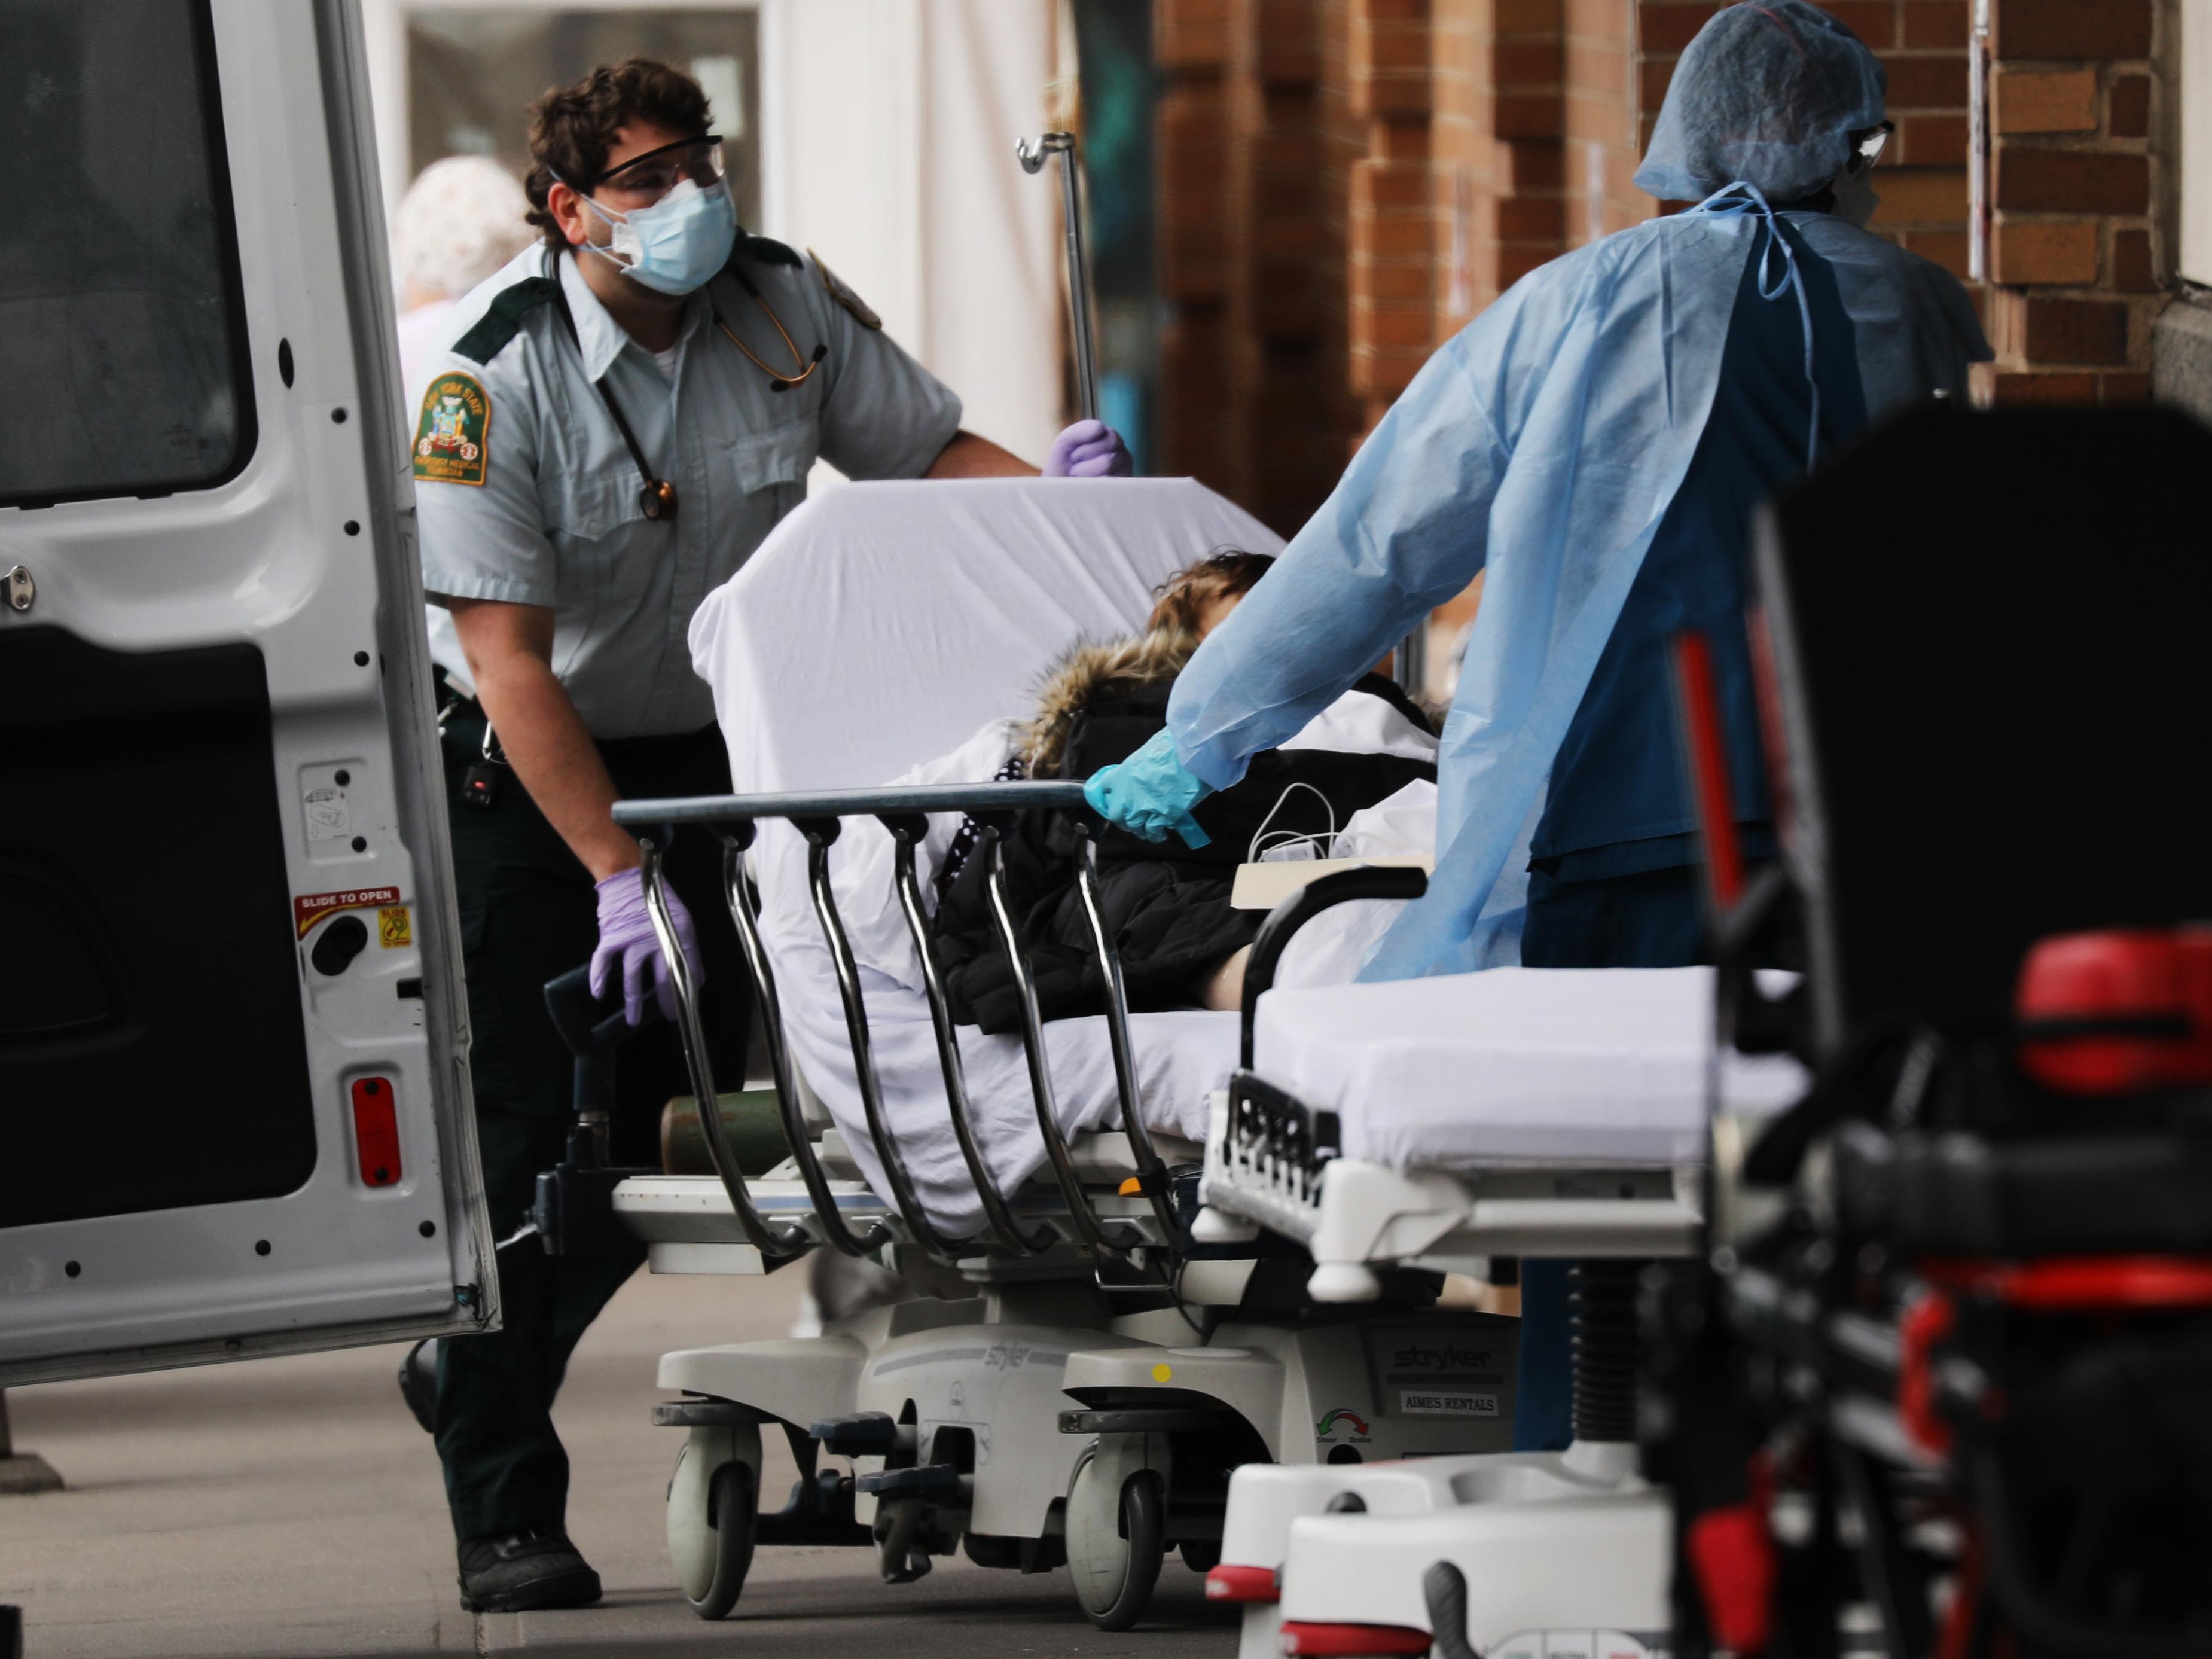 How To Get Health Insurance In Light Of Coronavirus Layoffs Shots Health News Npr